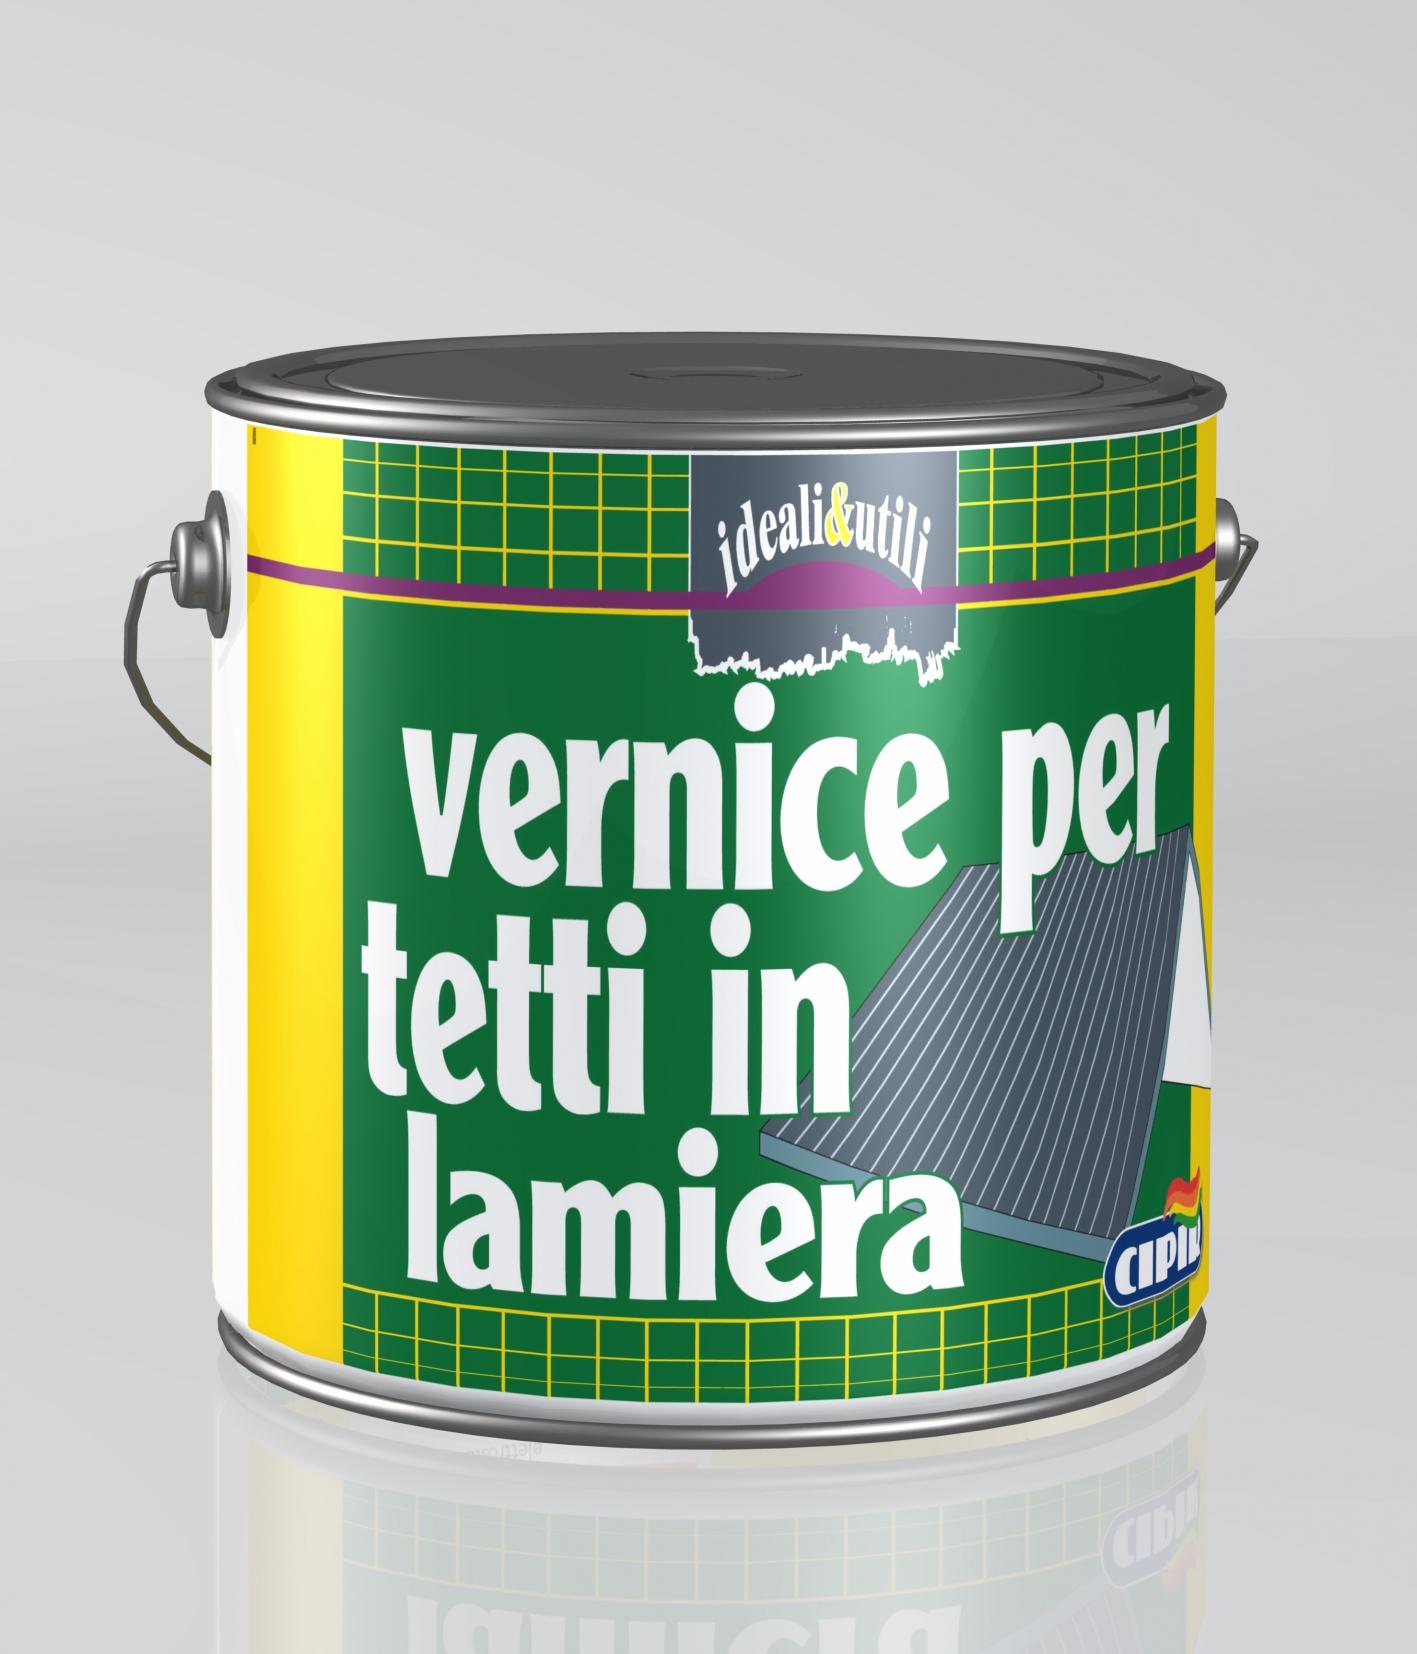 Tetto In Lamiera Opinioni cipir - product